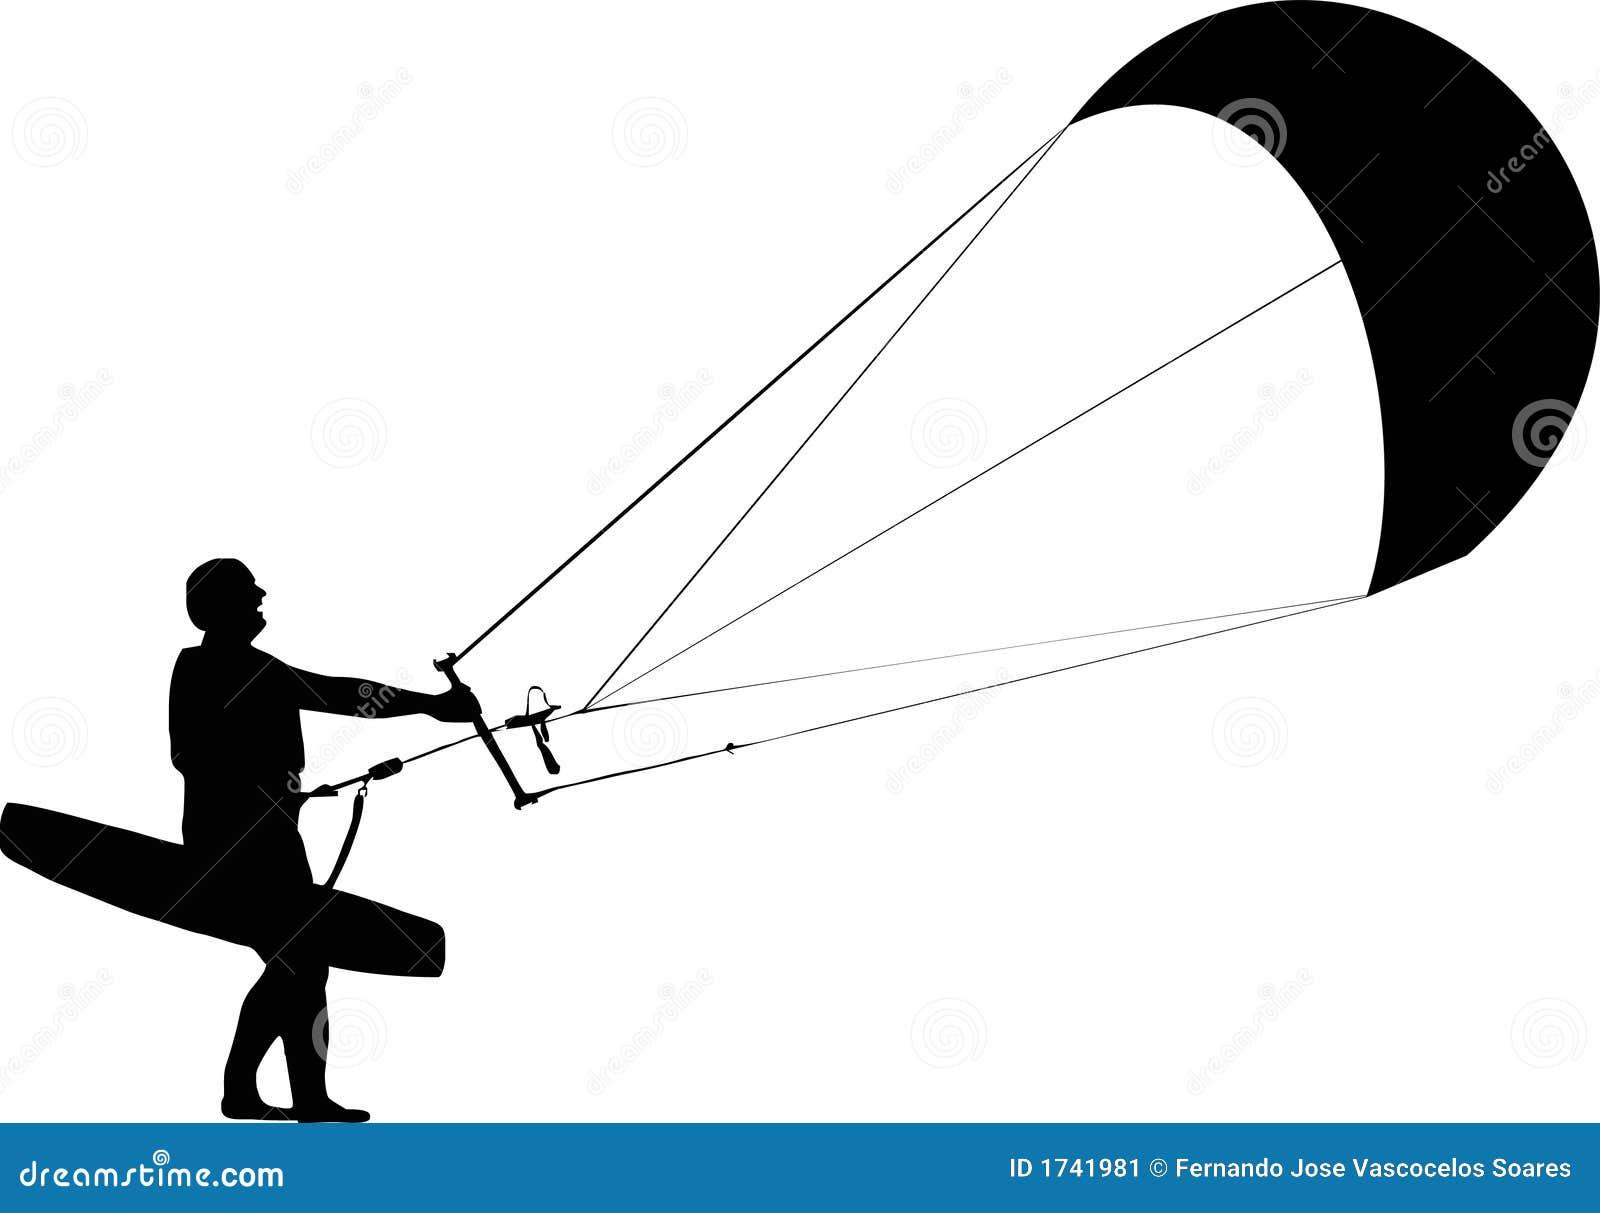 Kitesurfer Silhouette Stock Image Image 1741981